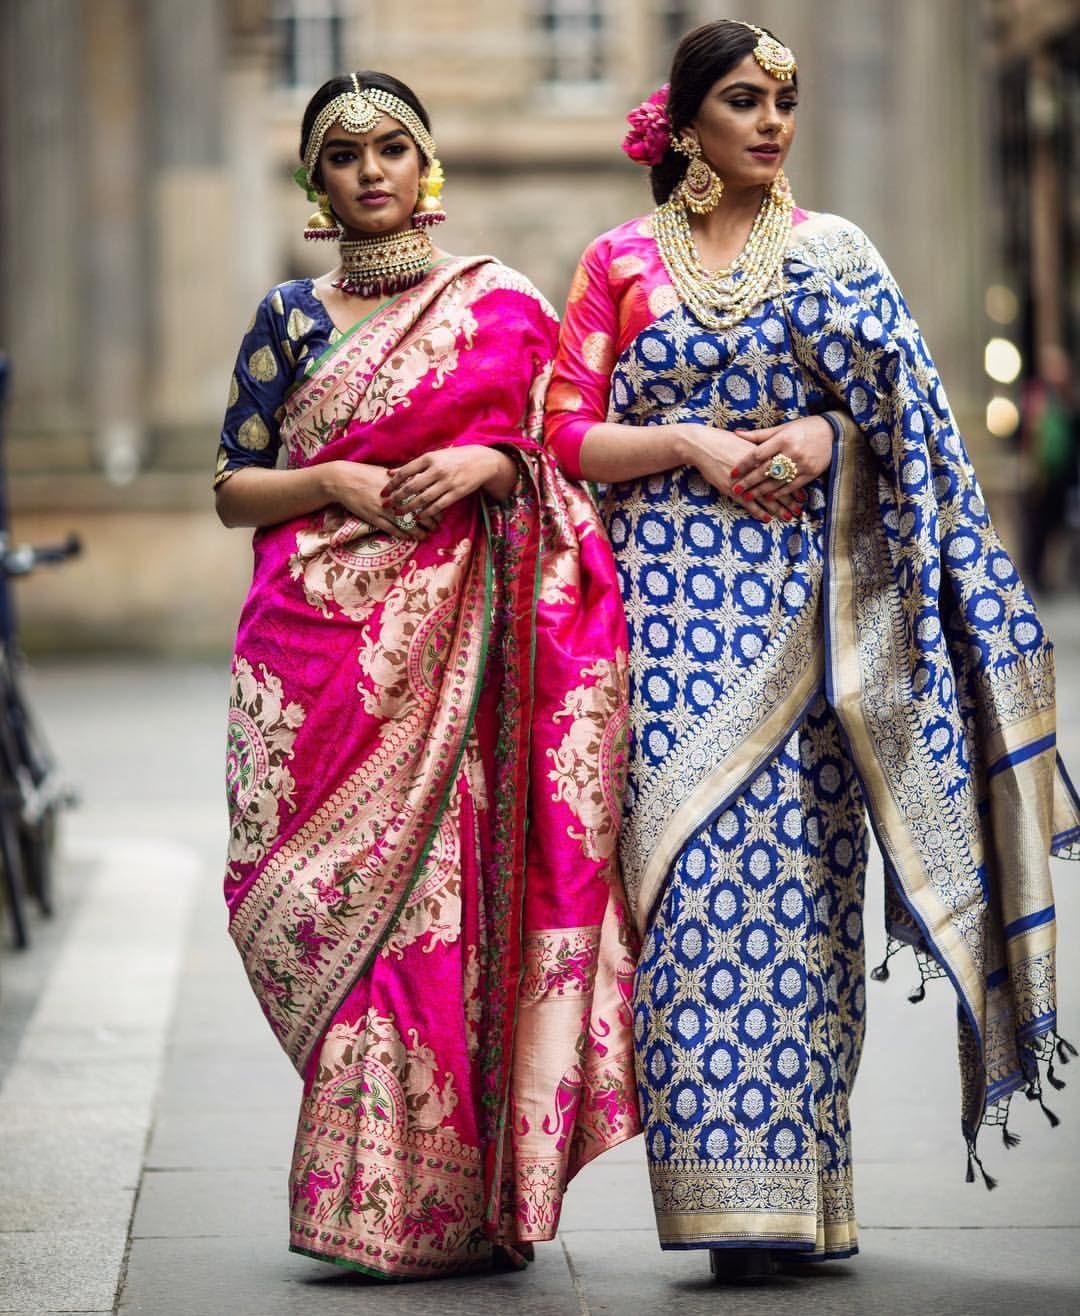 Hermosa Novios Viste Indio Ornamento - Ideas de Vestidos de Boda ...